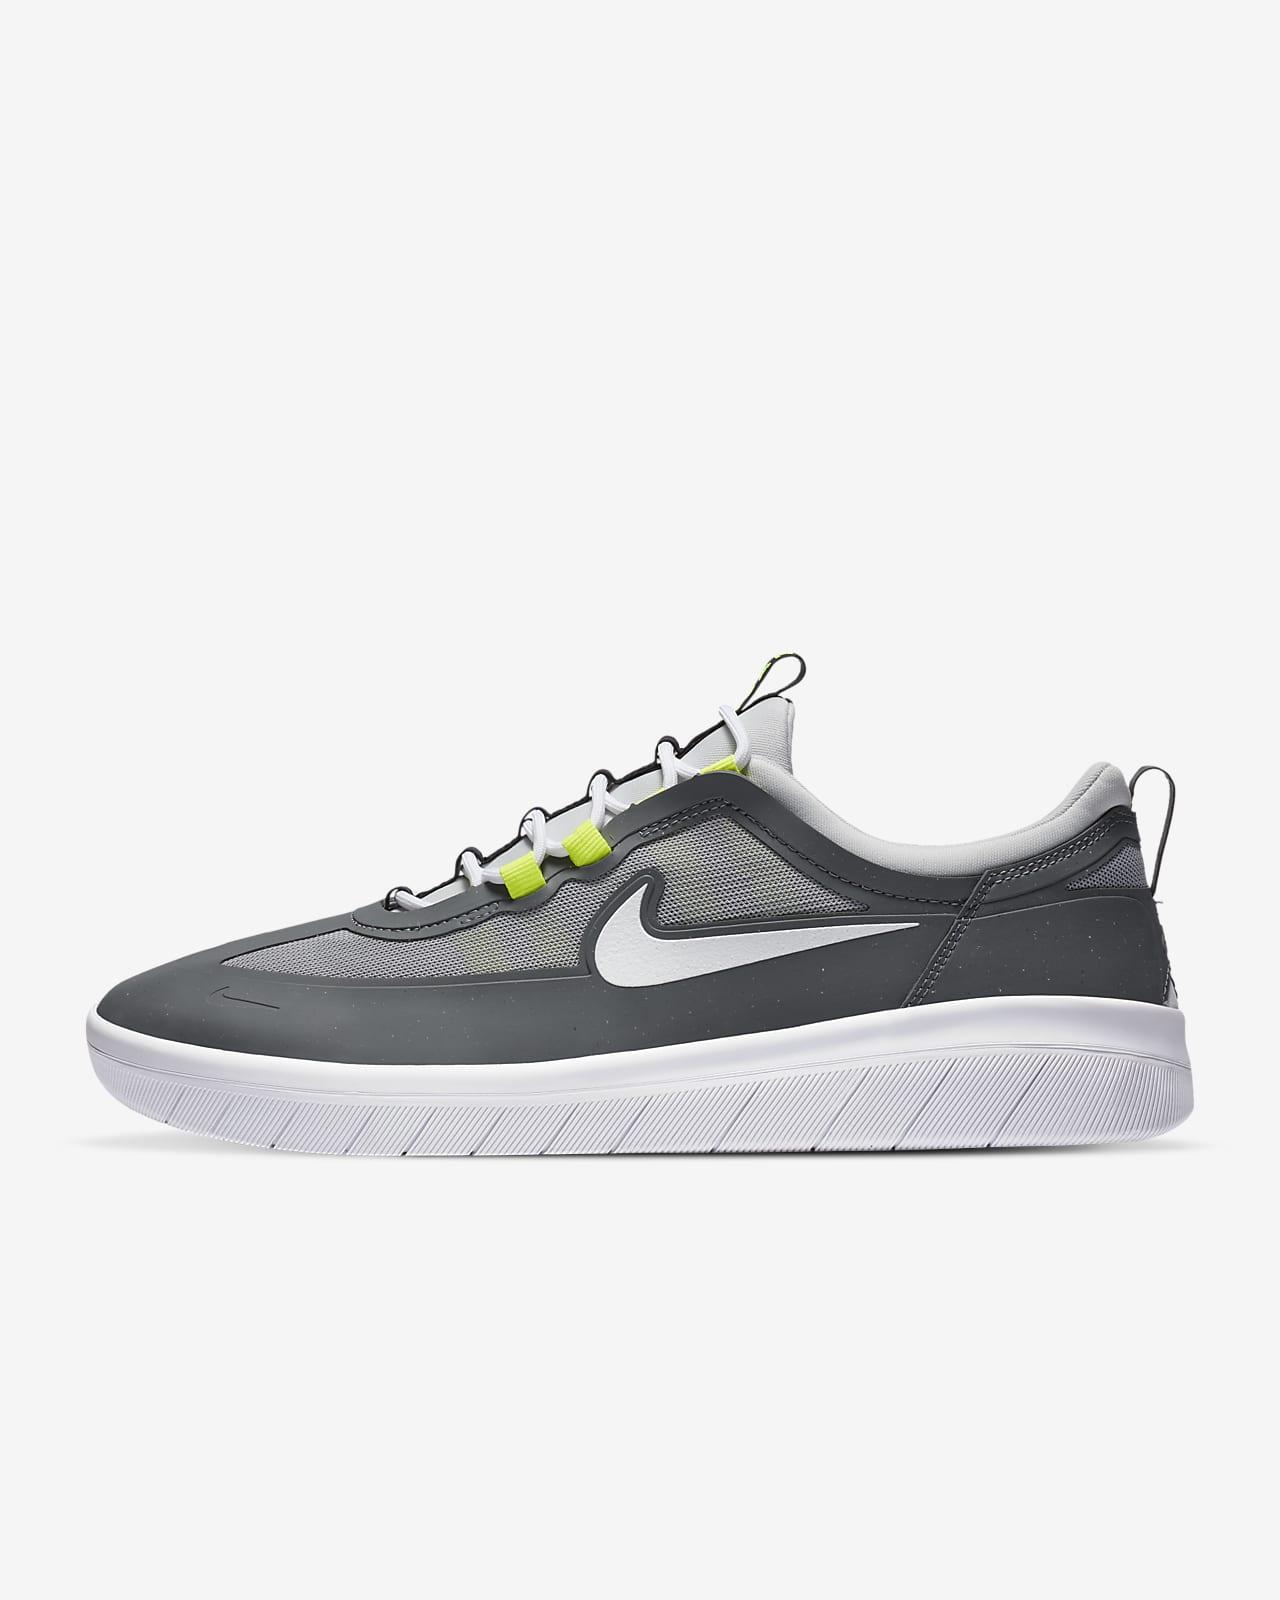 Nike SB Nyjah Free 2 Skateboardschuh